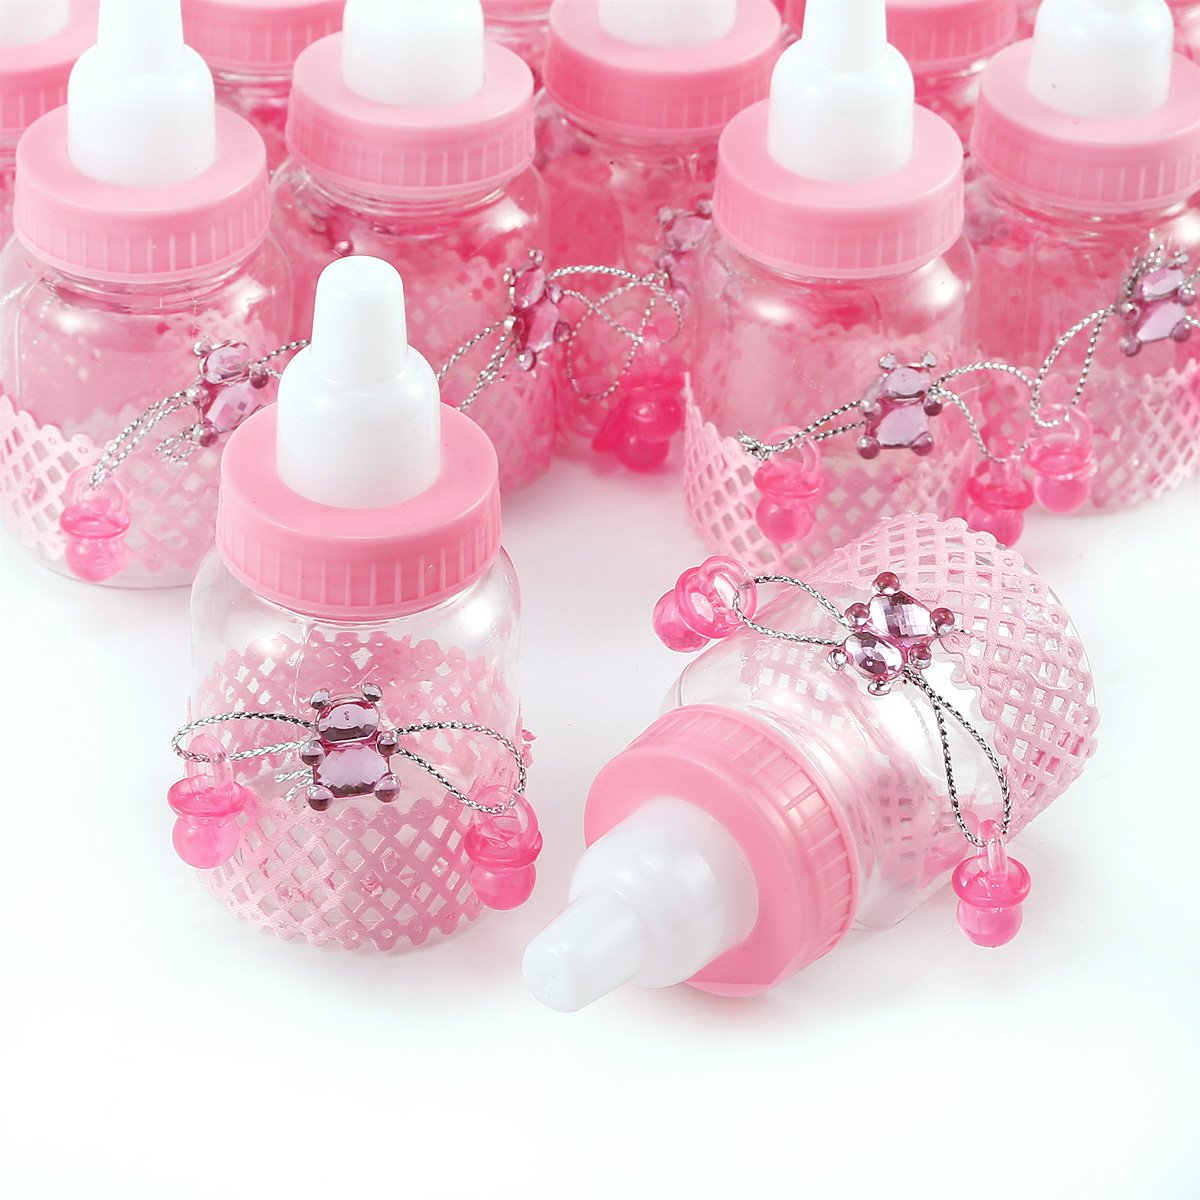 CLE DE TOUS - 24pcs Mini biberón Dulceros Recuerdos para Dulces Regalos para baby showers Bautizo (Rosa Osito con chupete): Amazon.es: Hogar